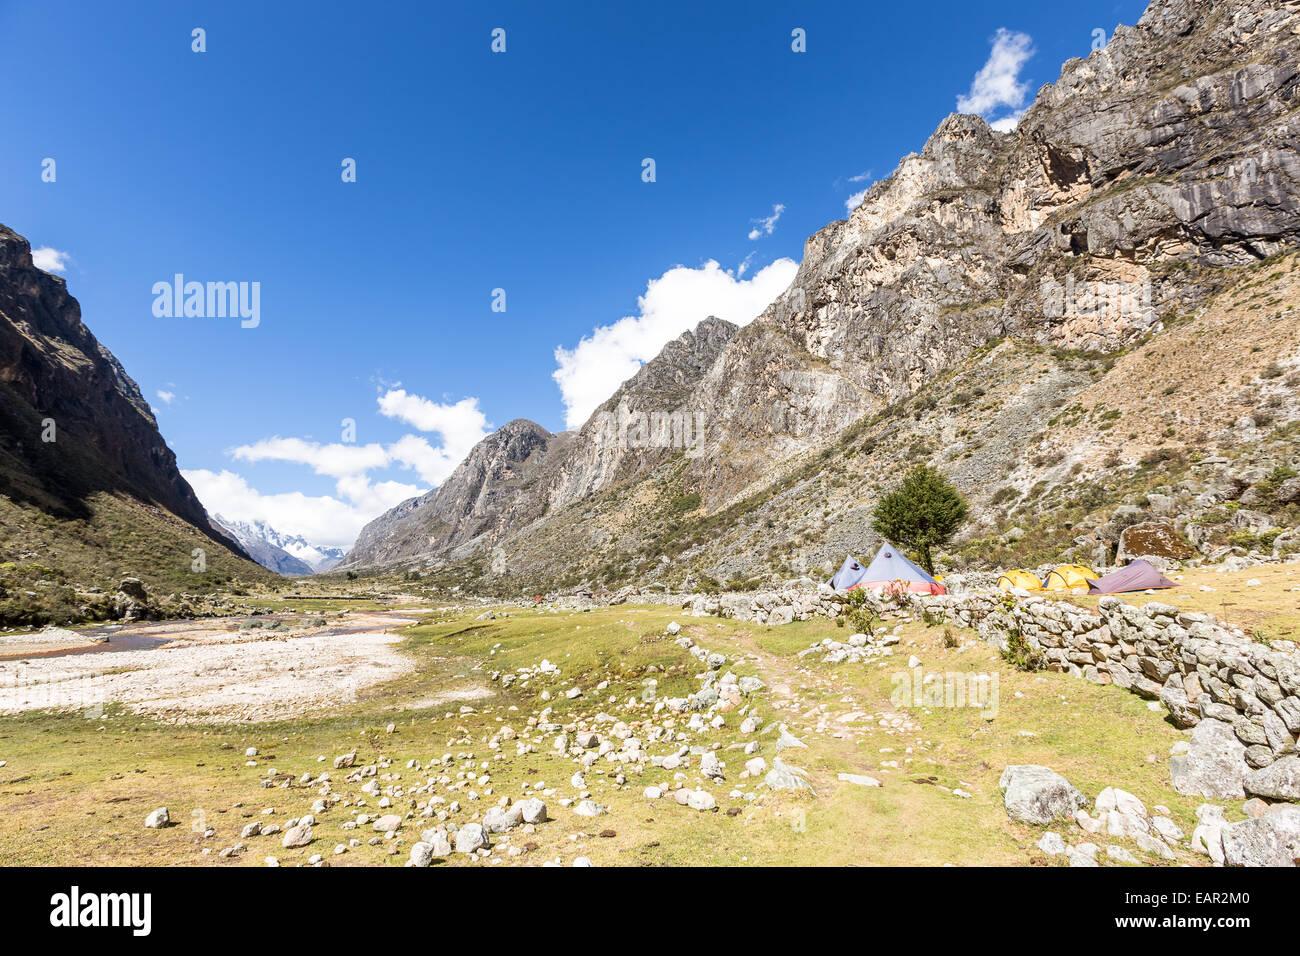 Llamacorral camping place, Santa Cruz valley, Andes, Peru, South America - Stock Image